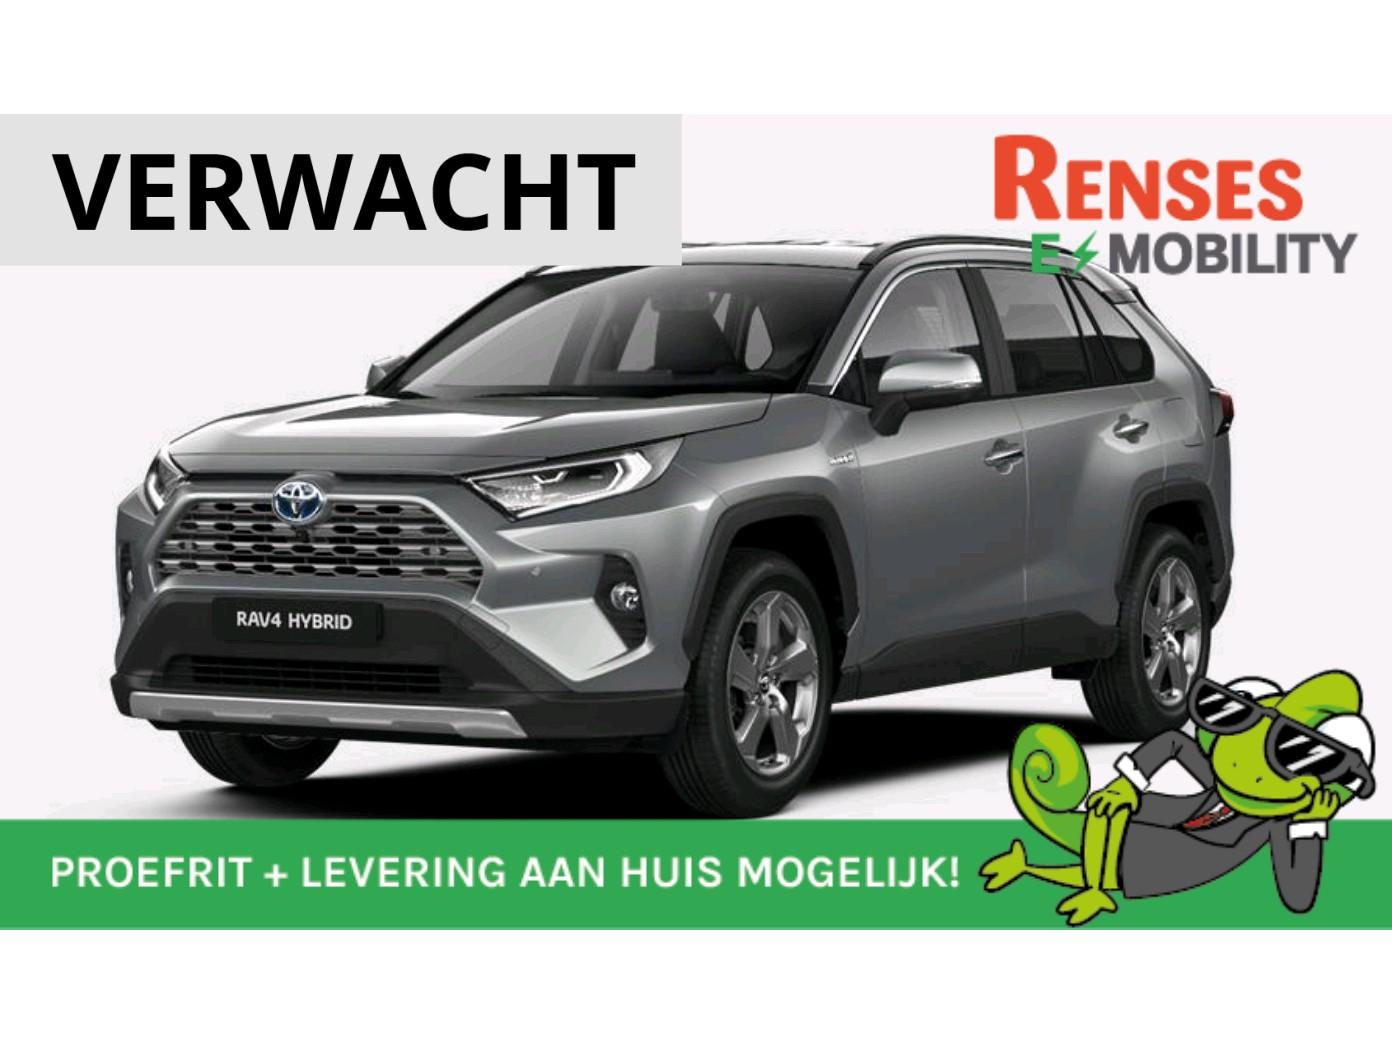 Toyota Rav4 2.5 hybrid awd executive / pano.dak / 15% korting